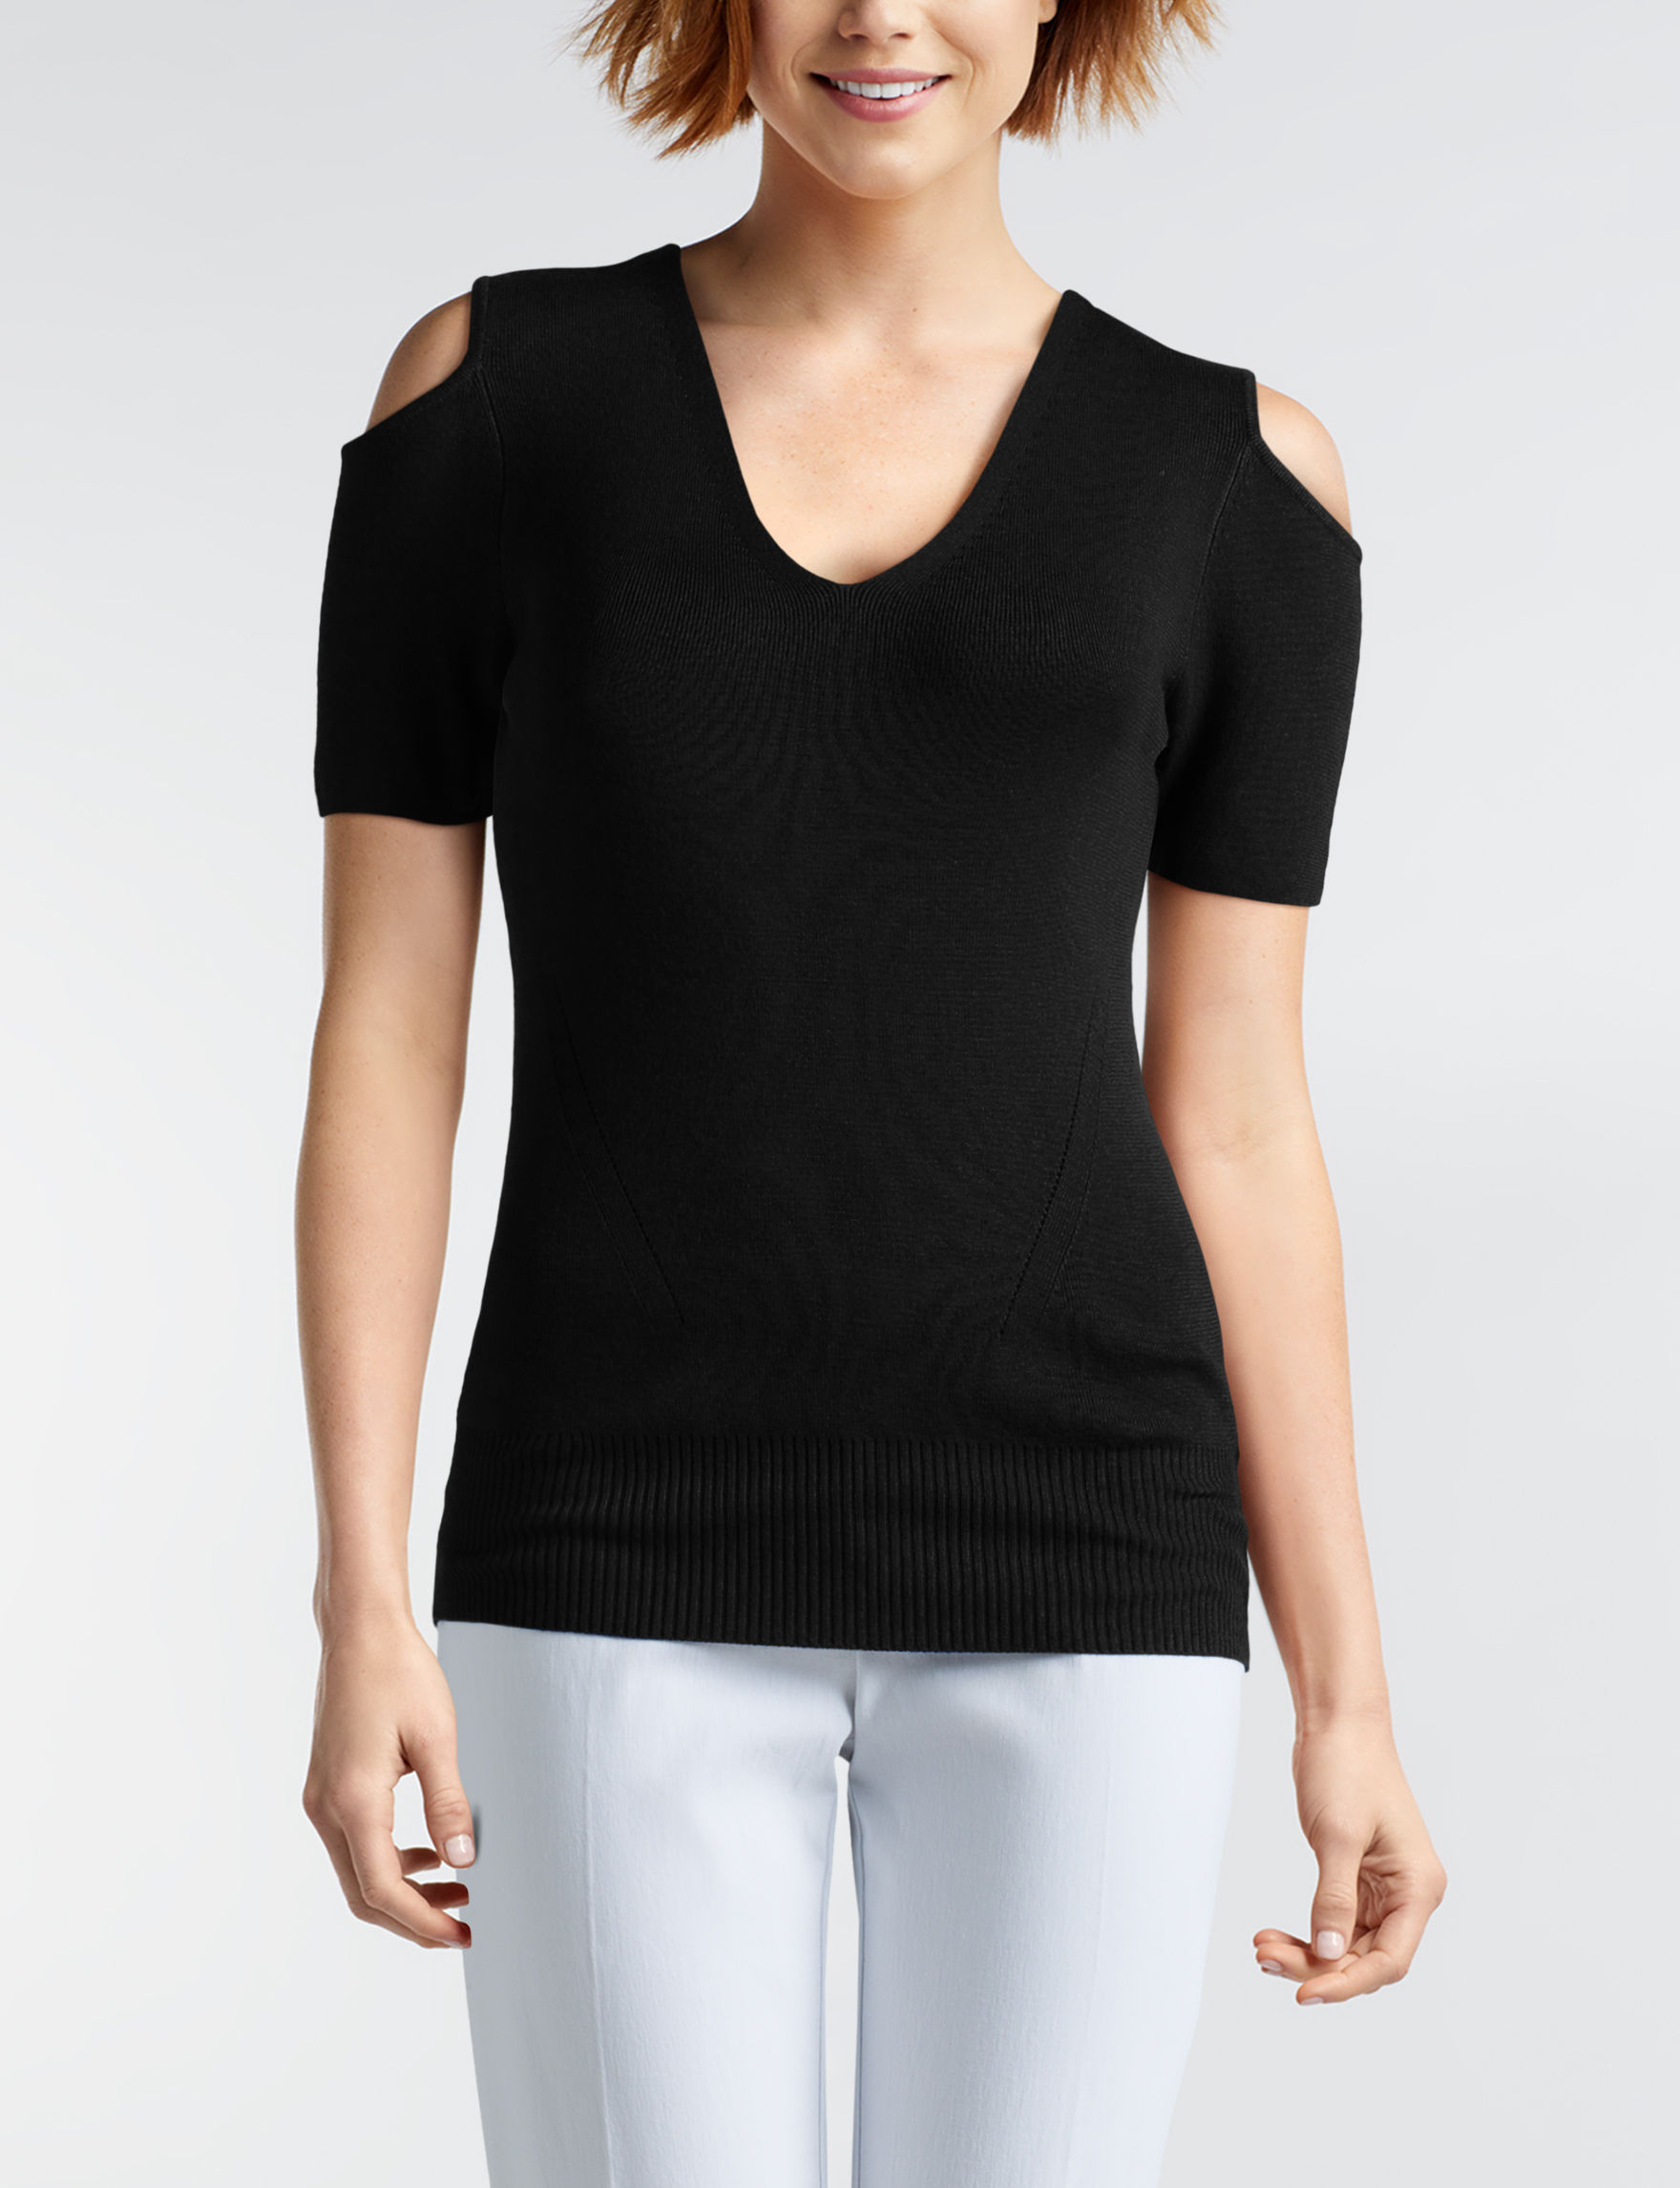 Joseph A Black Shirts & Blouses